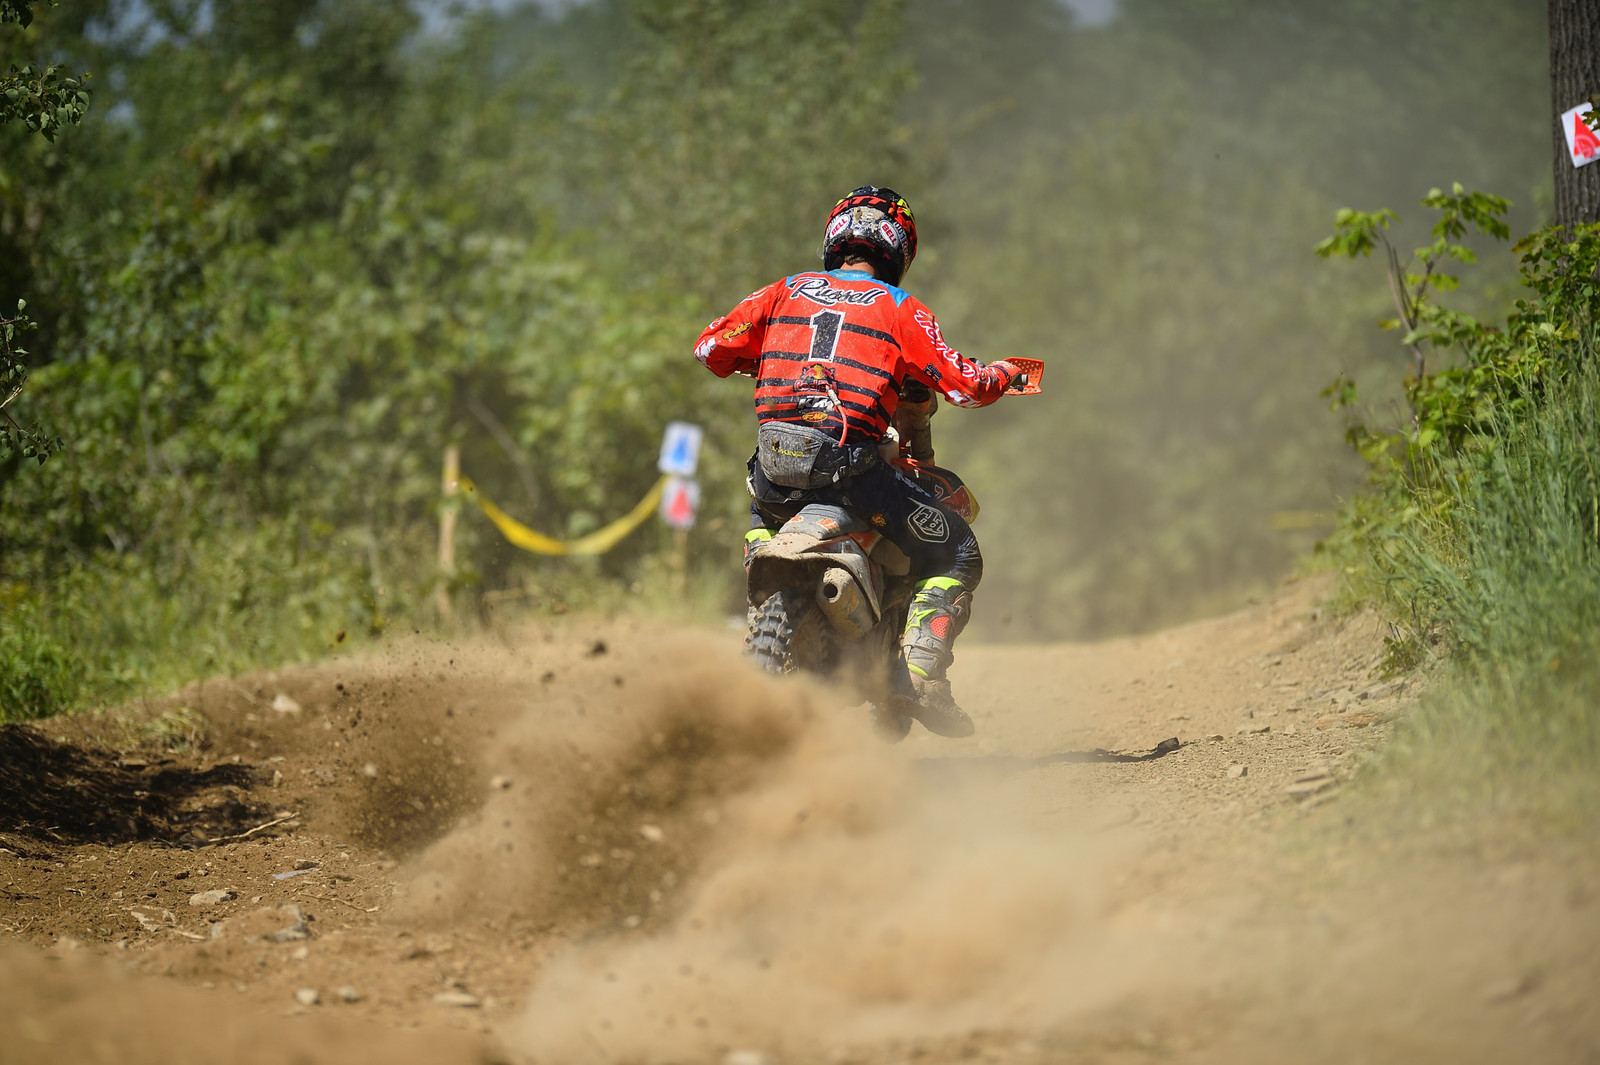 Kailub Russell - Tomahawk GNCC - Motocross Pictures - Vital MX